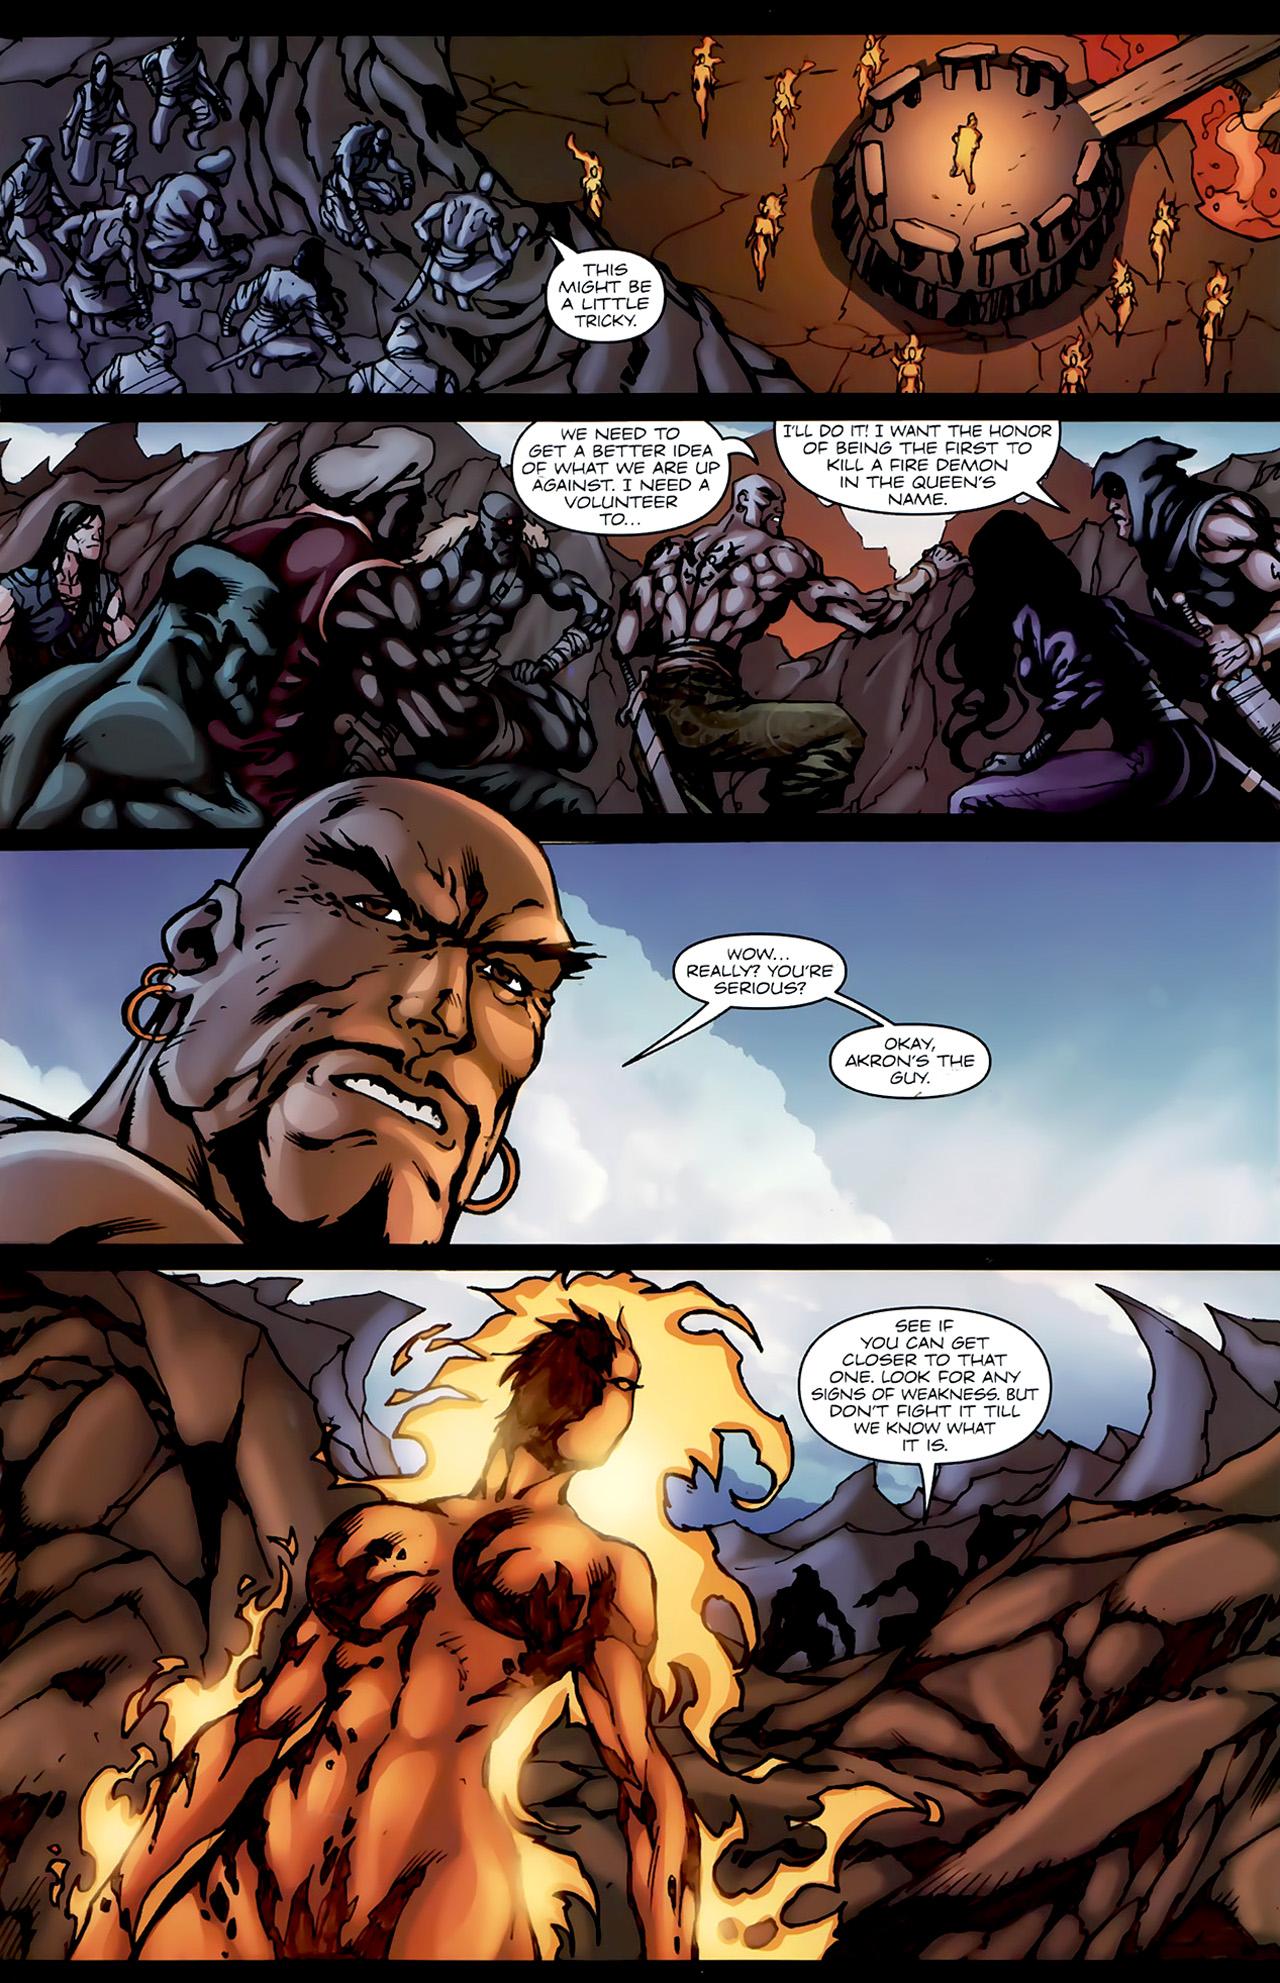 Read online 1001 Arabian Nights: The Adventures of Sinbad comic -  Issue #4 - 13